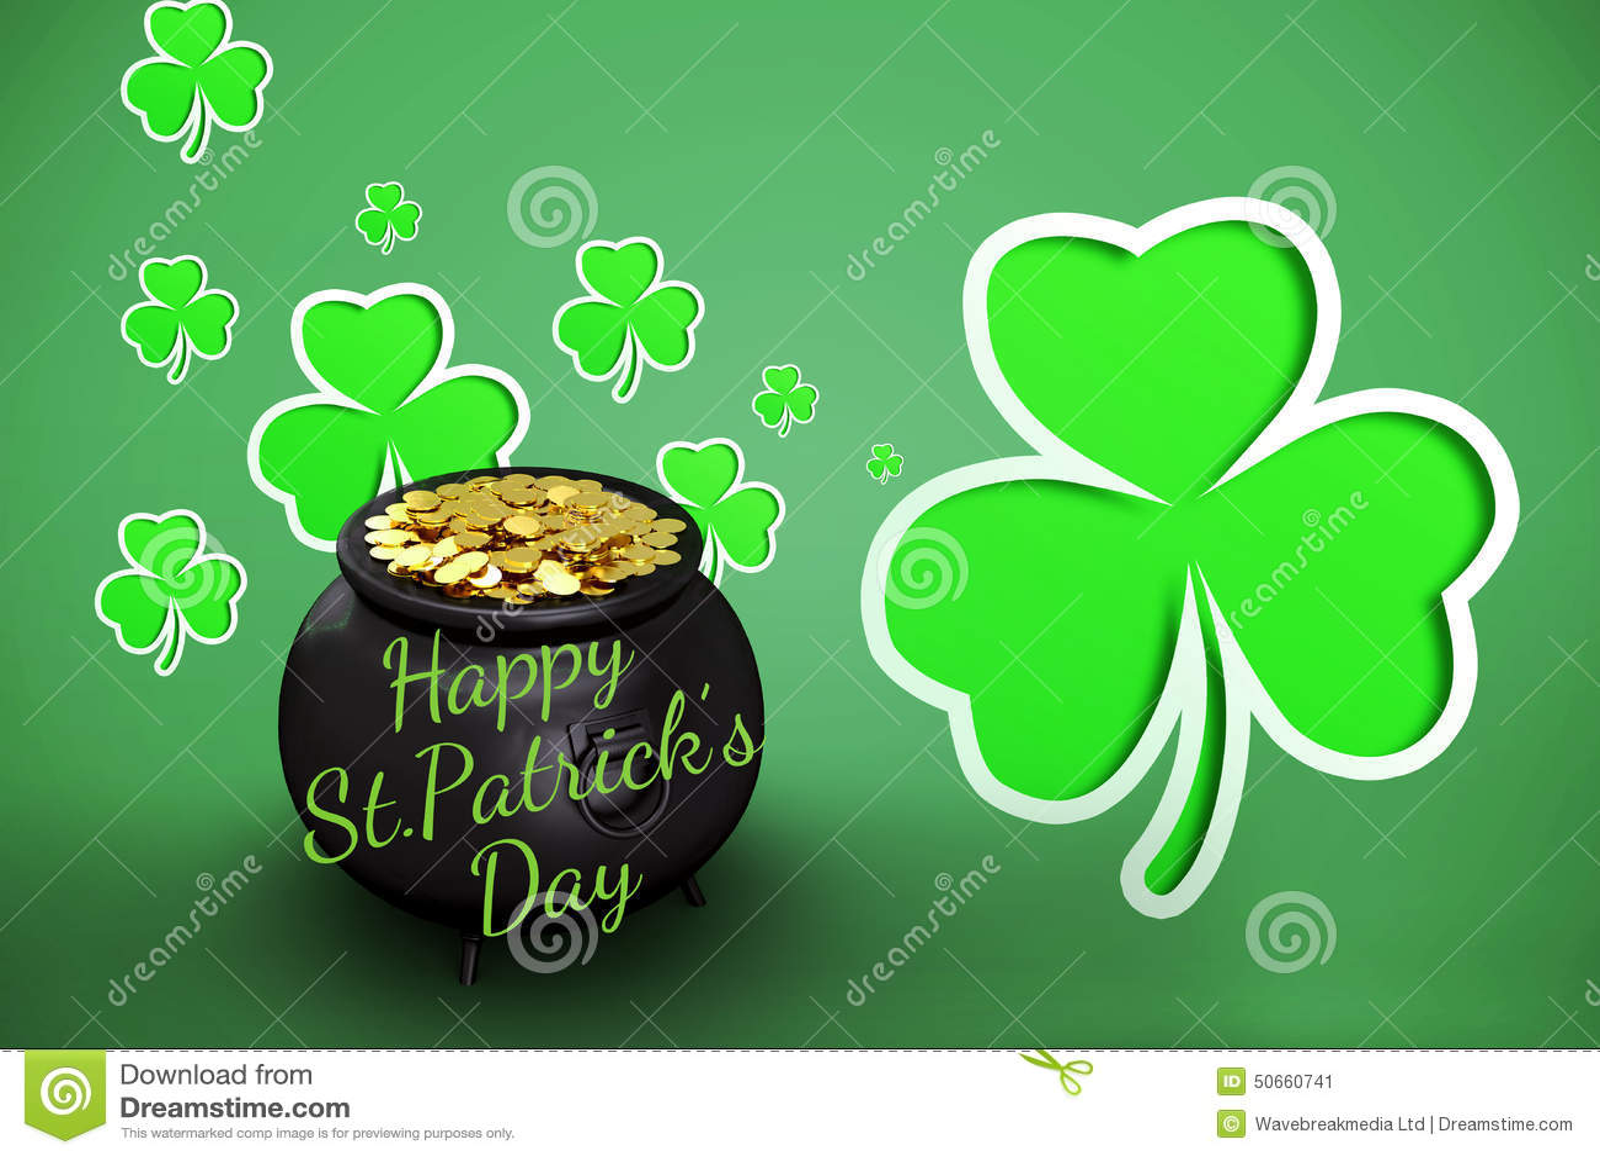 Composite image of happy st patricks day